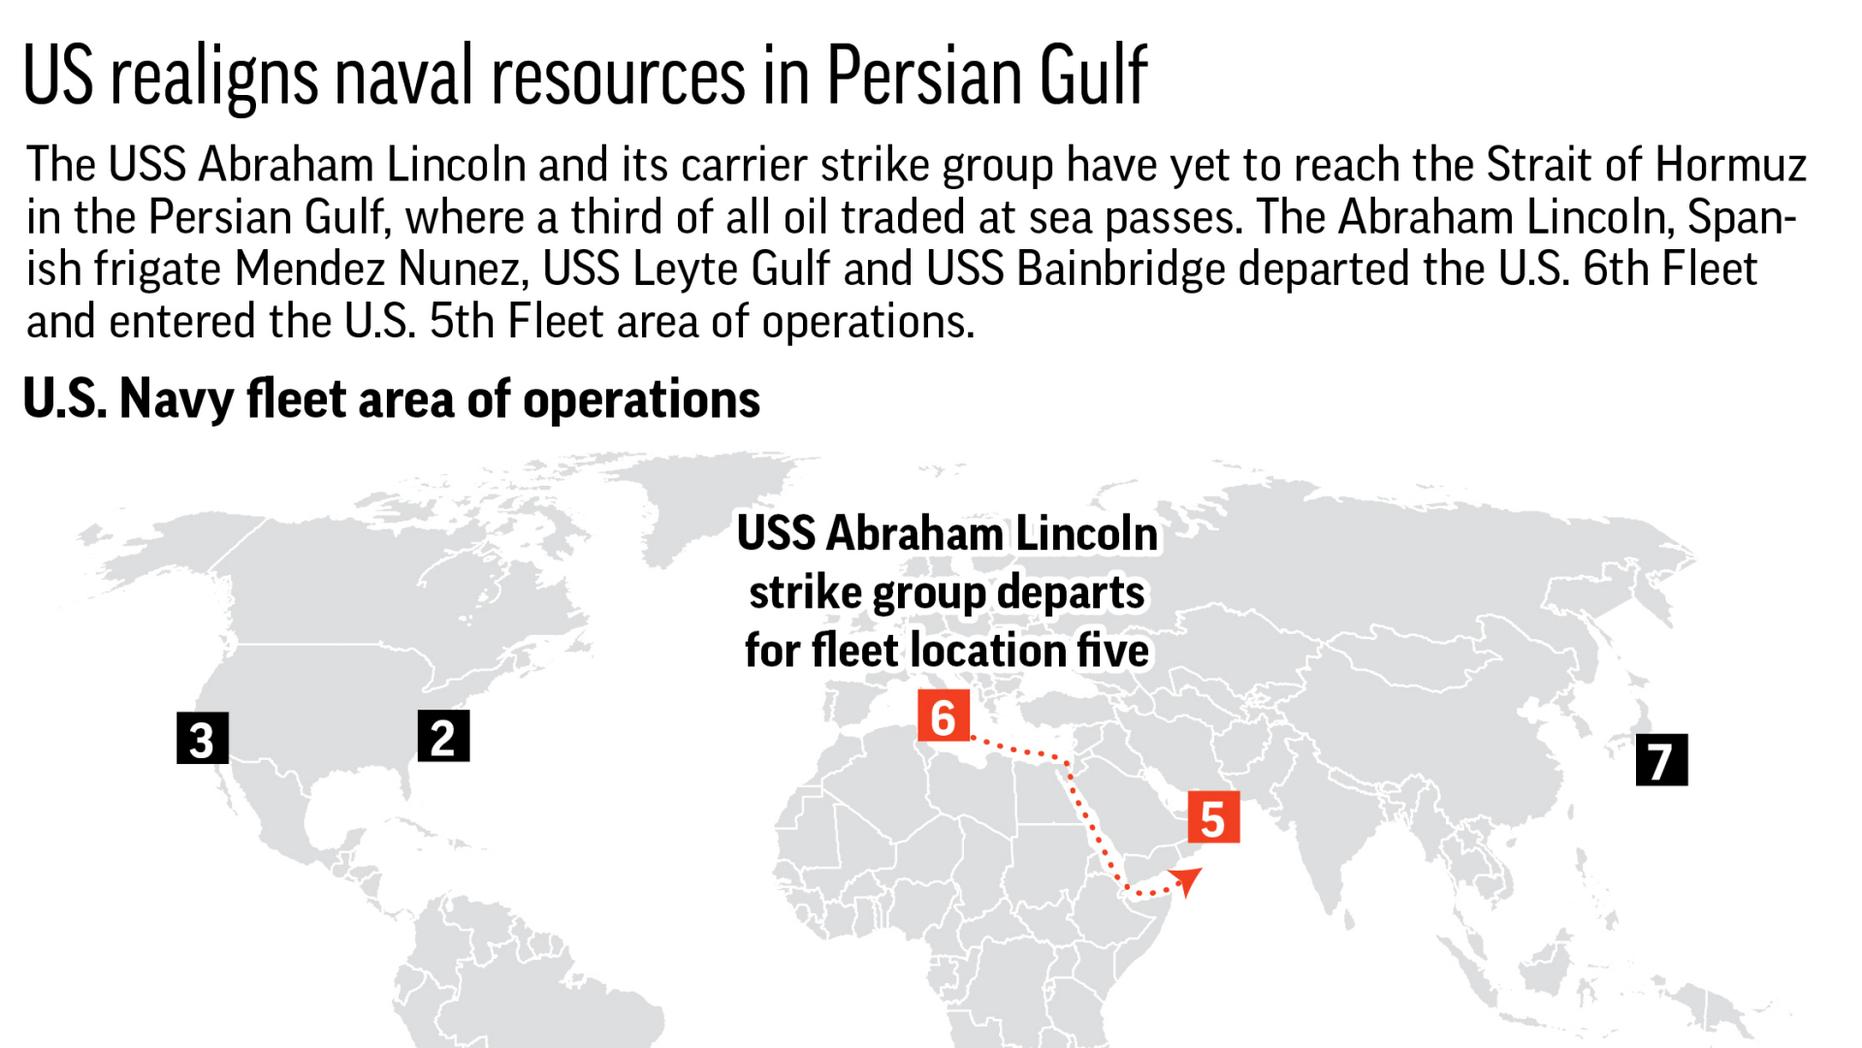 Westlake Legal Group ContentBroker_contentid-072f8878630346d9af5e3275c07ca4de US warns airliners flying in Persian Gulf amid Iran tensions fox-news/world/world-regions/middle-east fox-news/world/world-regions/americas fox-news/world fox-news/us fnc/world fnc fcb98367-37c7-5e60-a11a-05e80615c25c Dubai (United Arab Emirates) Associated Press article